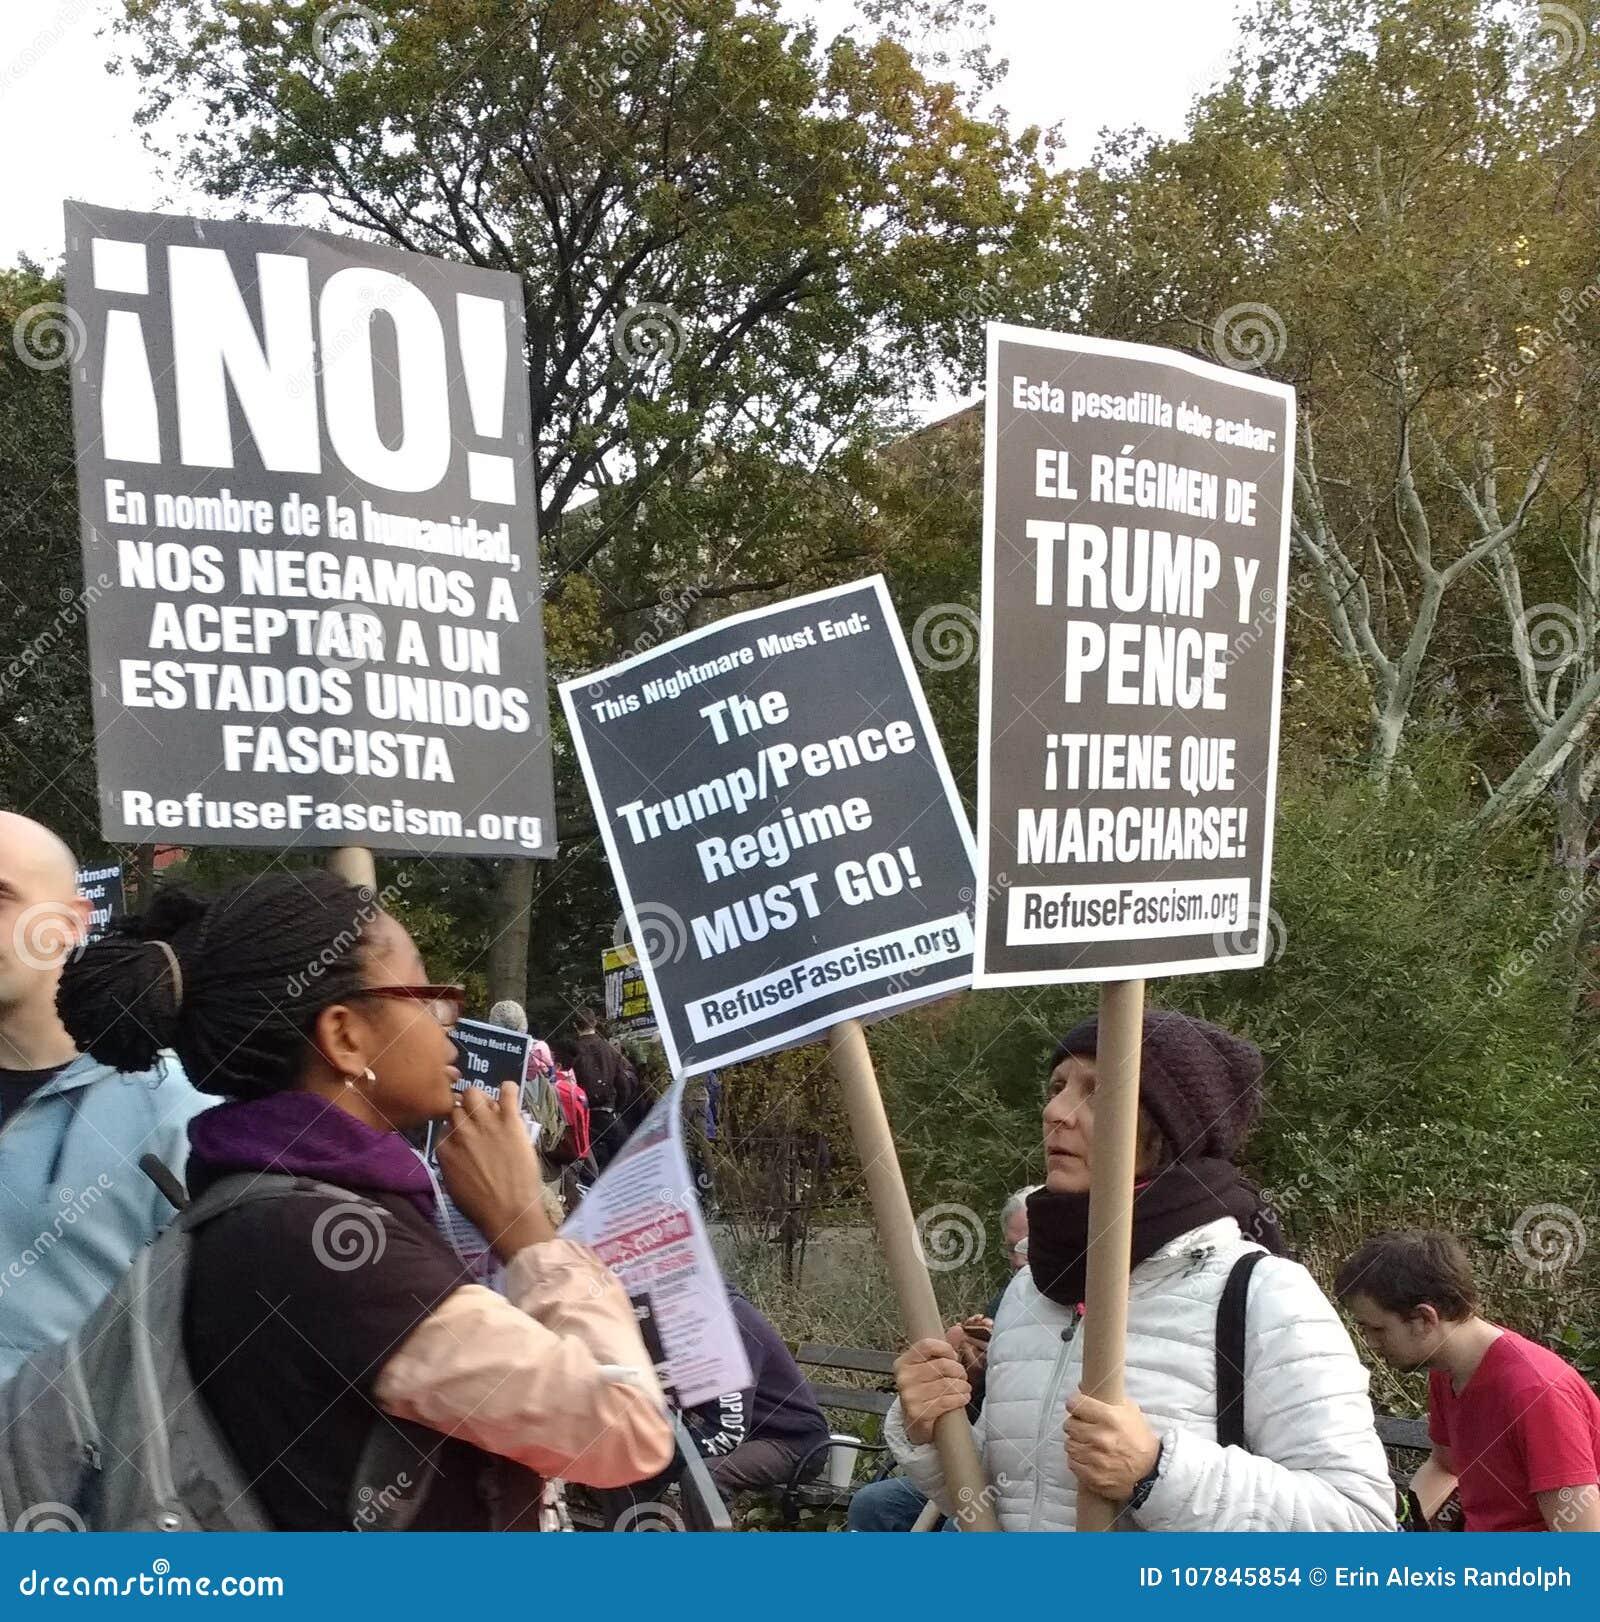 Trump Regime Must Go, Refuse Fascism, Washington Square Park, NYC, NY, USA